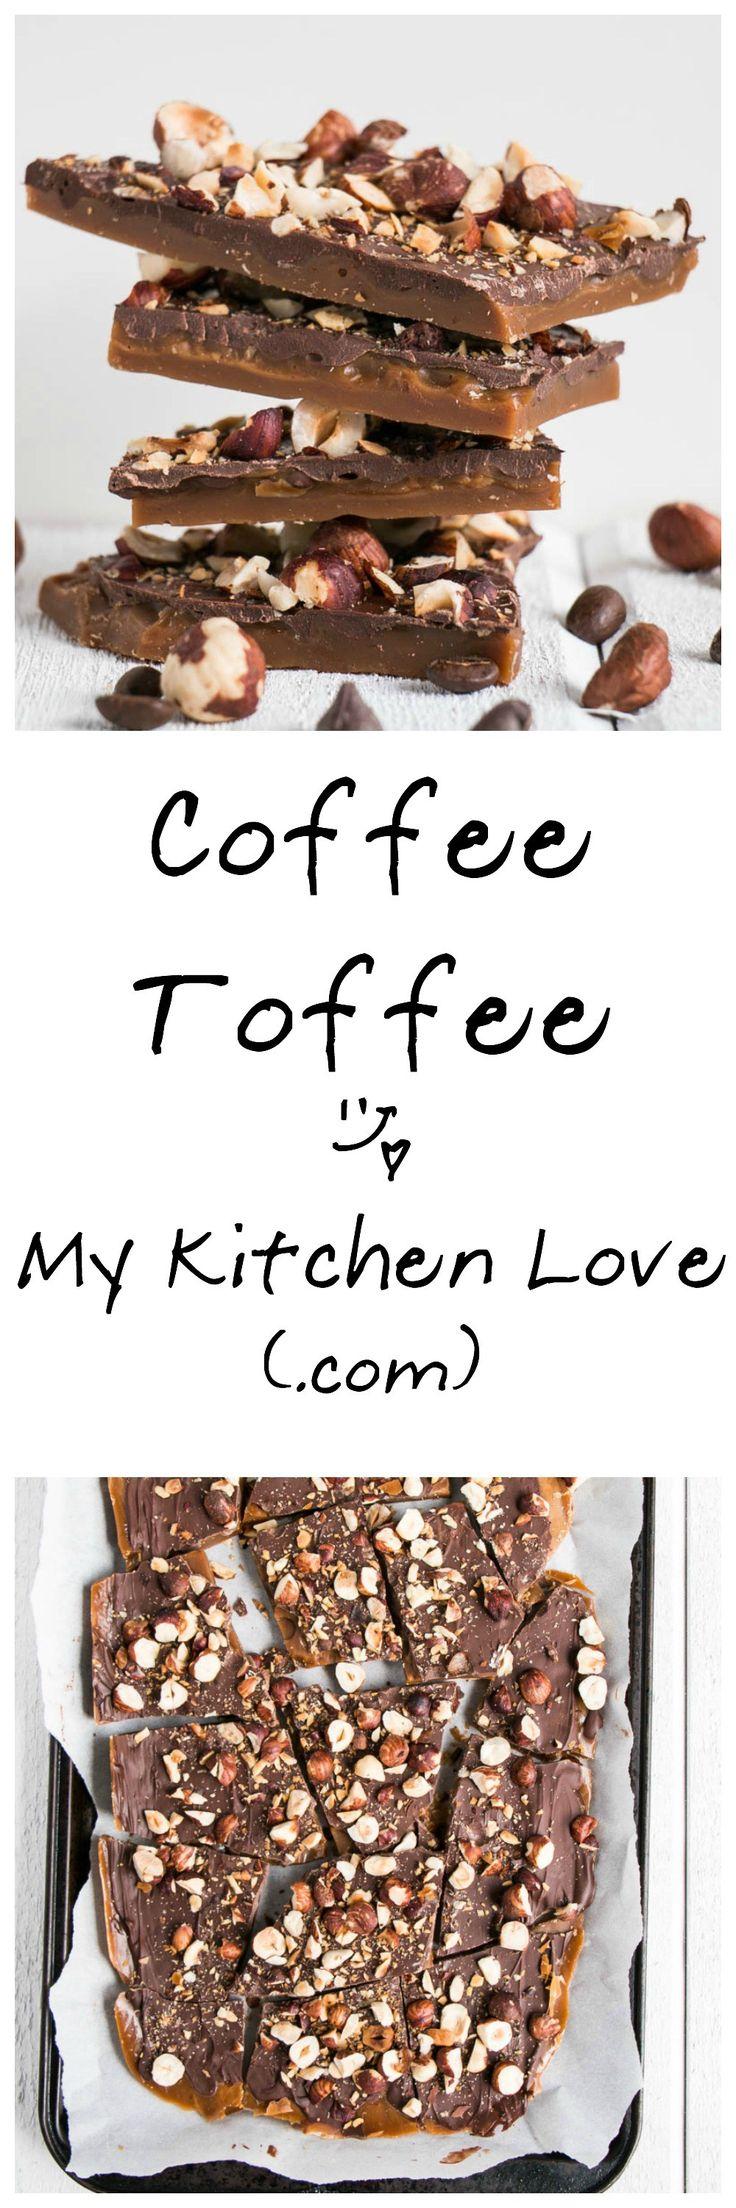 Coffee Toffee | My Kitchen Love